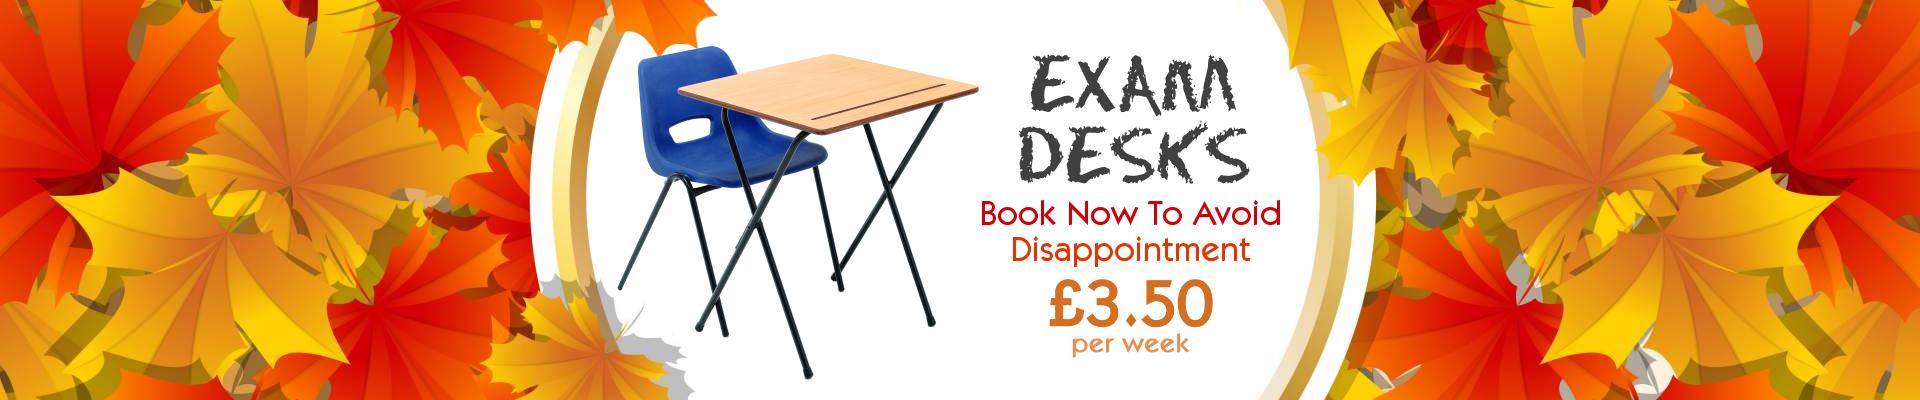 Exam Desk Rental London